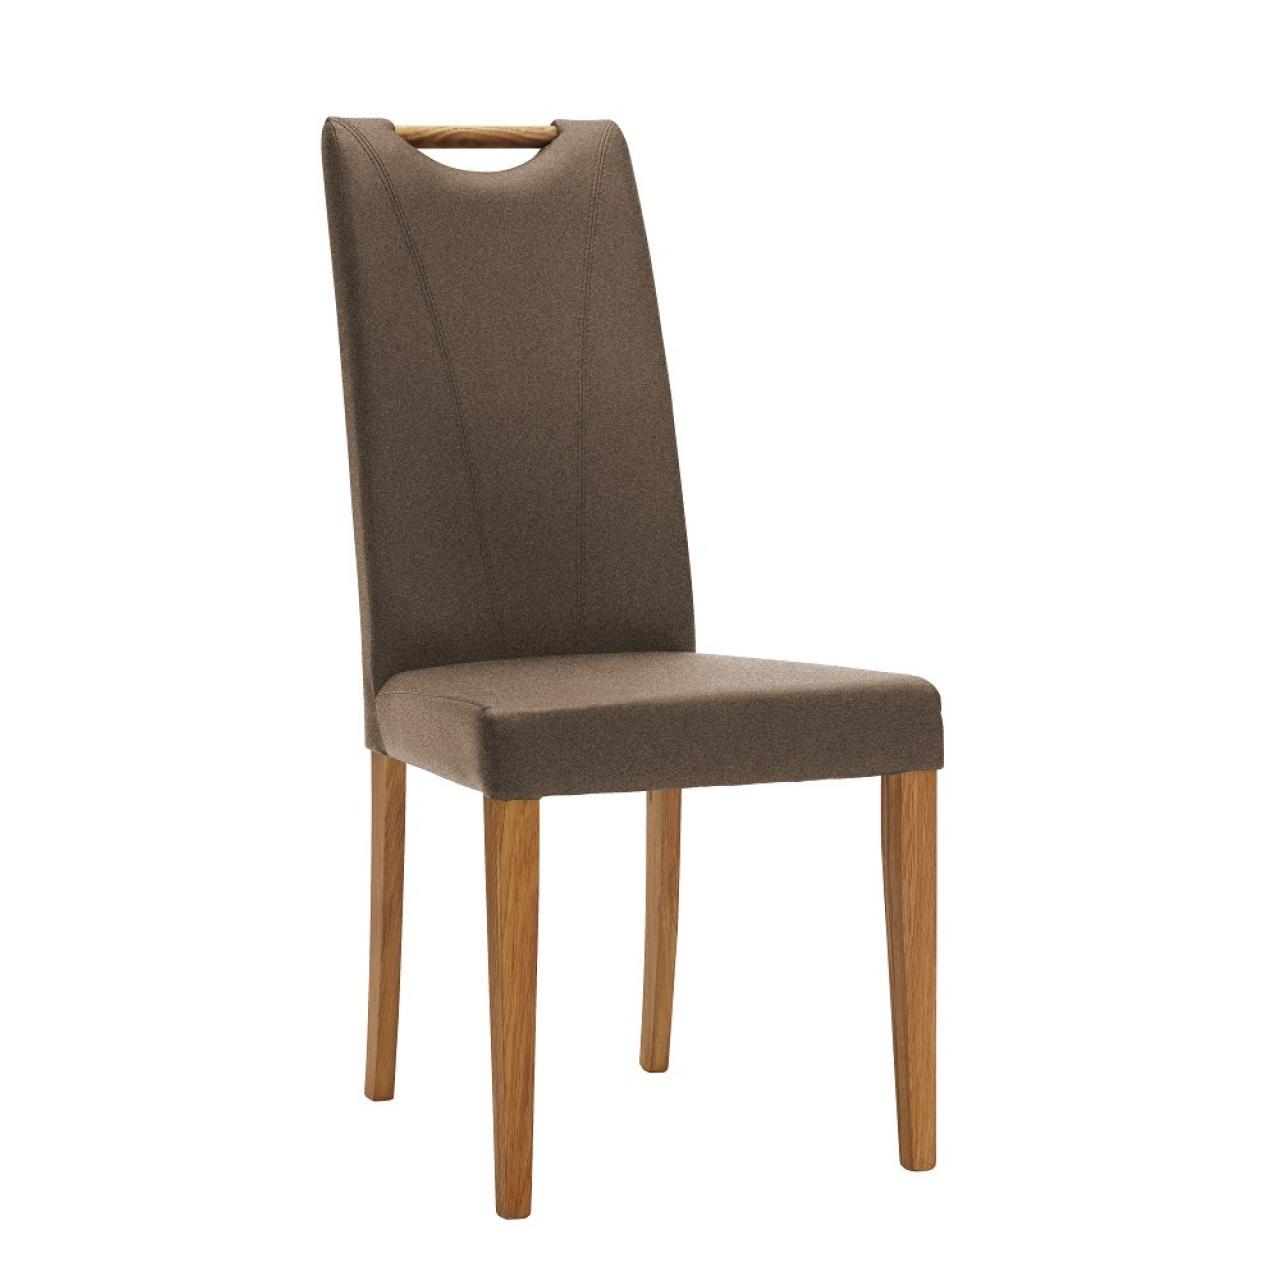 Stuhl 44 E6 Brown Natur Massivholz Stoff Esszimmerstuhl Küche 2er Set